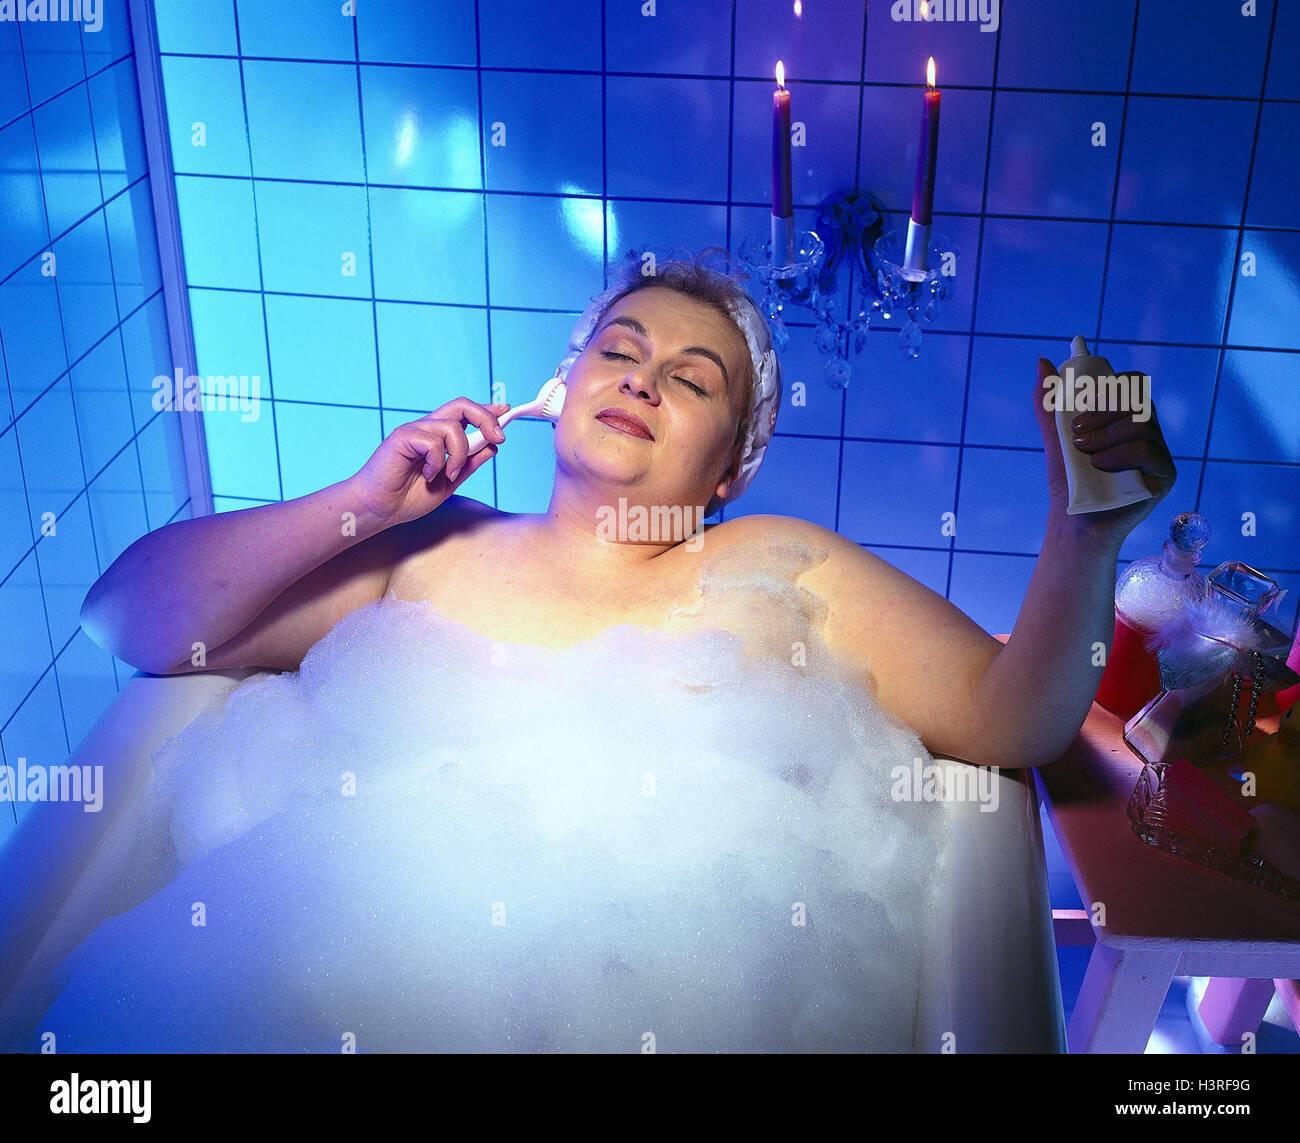 Bath, woman, overweight, facial massage, inside, bubble bath, bath, candles, thickly, overweight, massage, facial - Stock Image